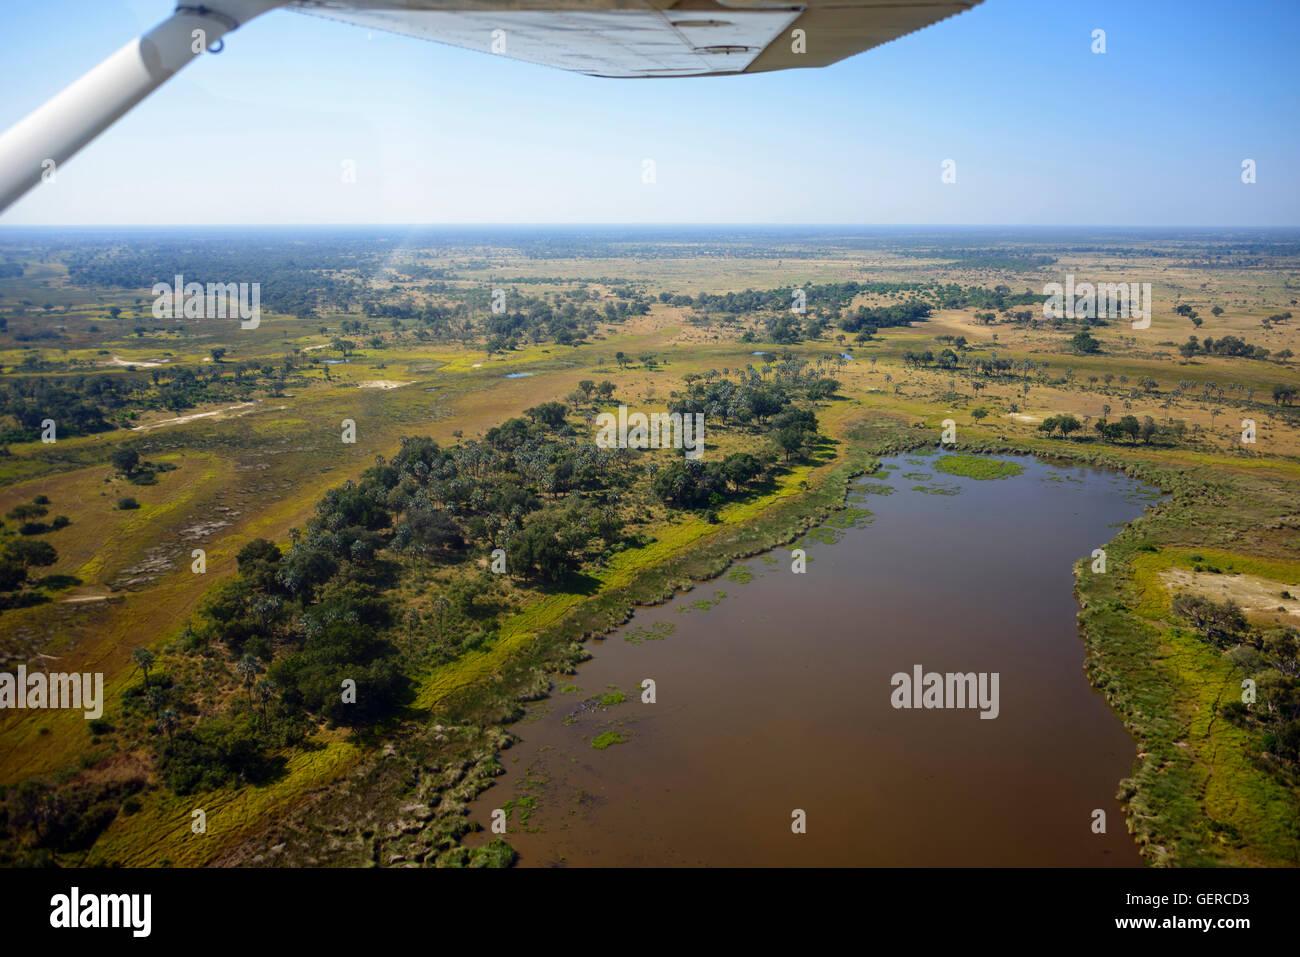 Aerial view, Okavango Delta, Botswana - Stock Image